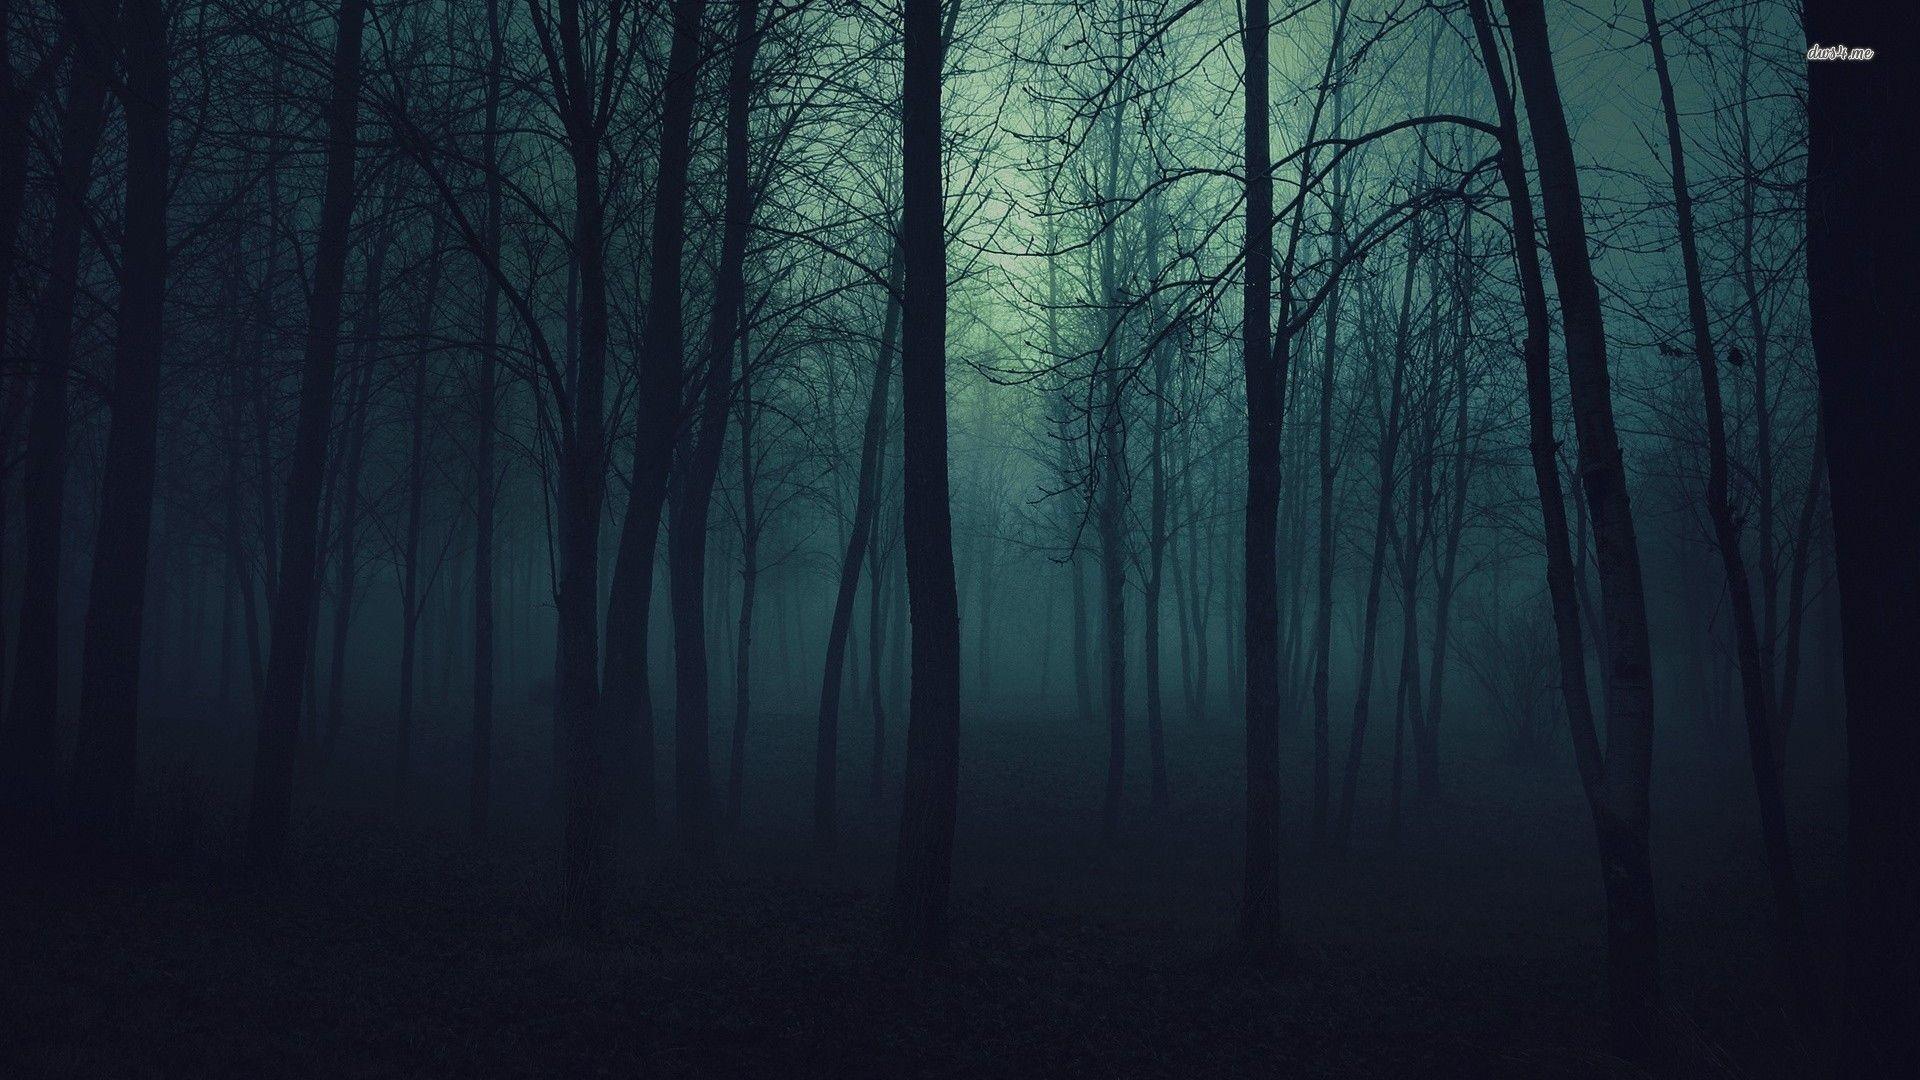 Free Download Dark Forest Wallpaper 1920x1080 For Windows